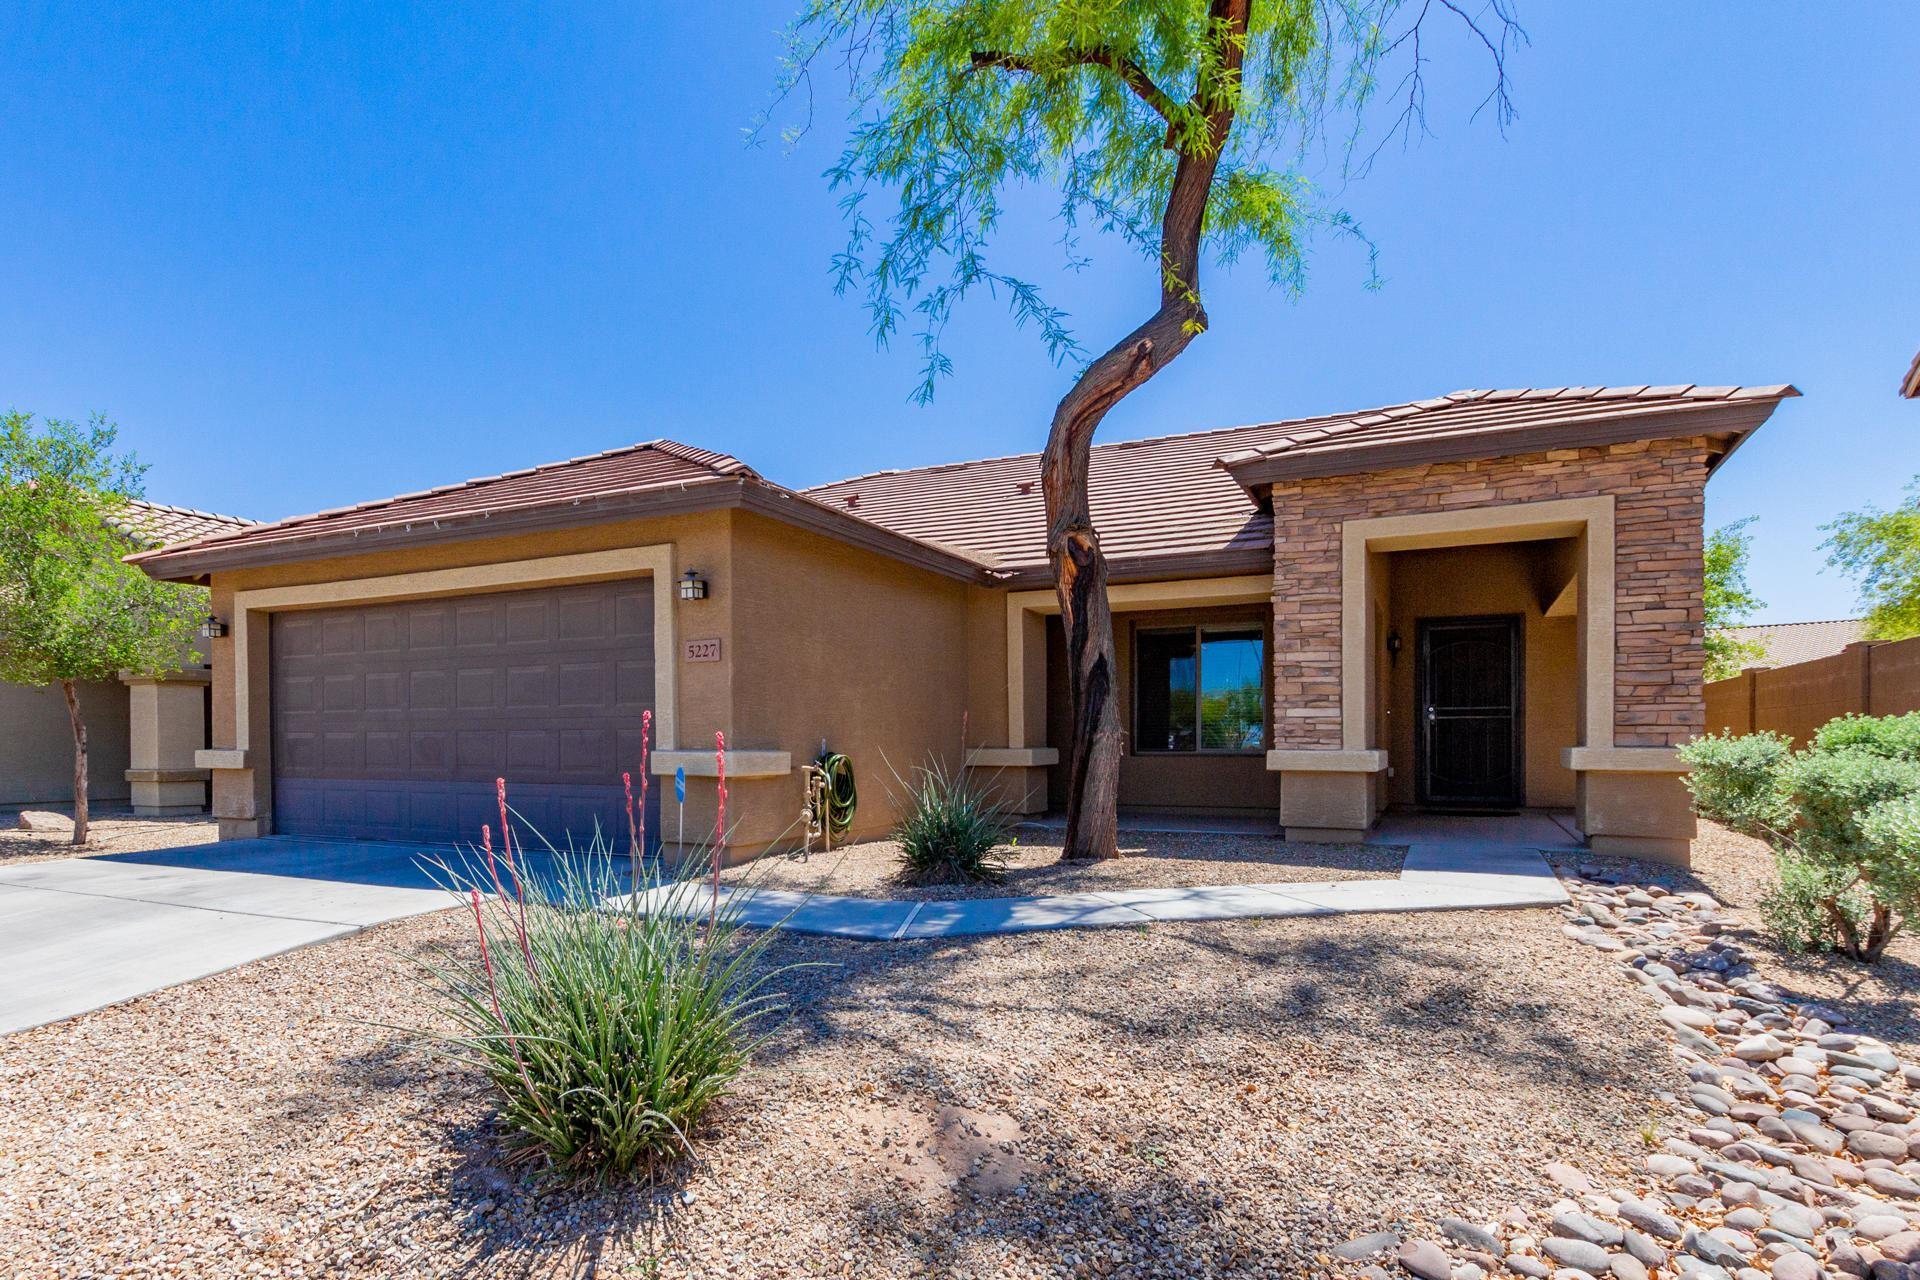 Photo of 5227 W HASAN Drive, Laveen, AZ 85339 (MLS # 6228242)